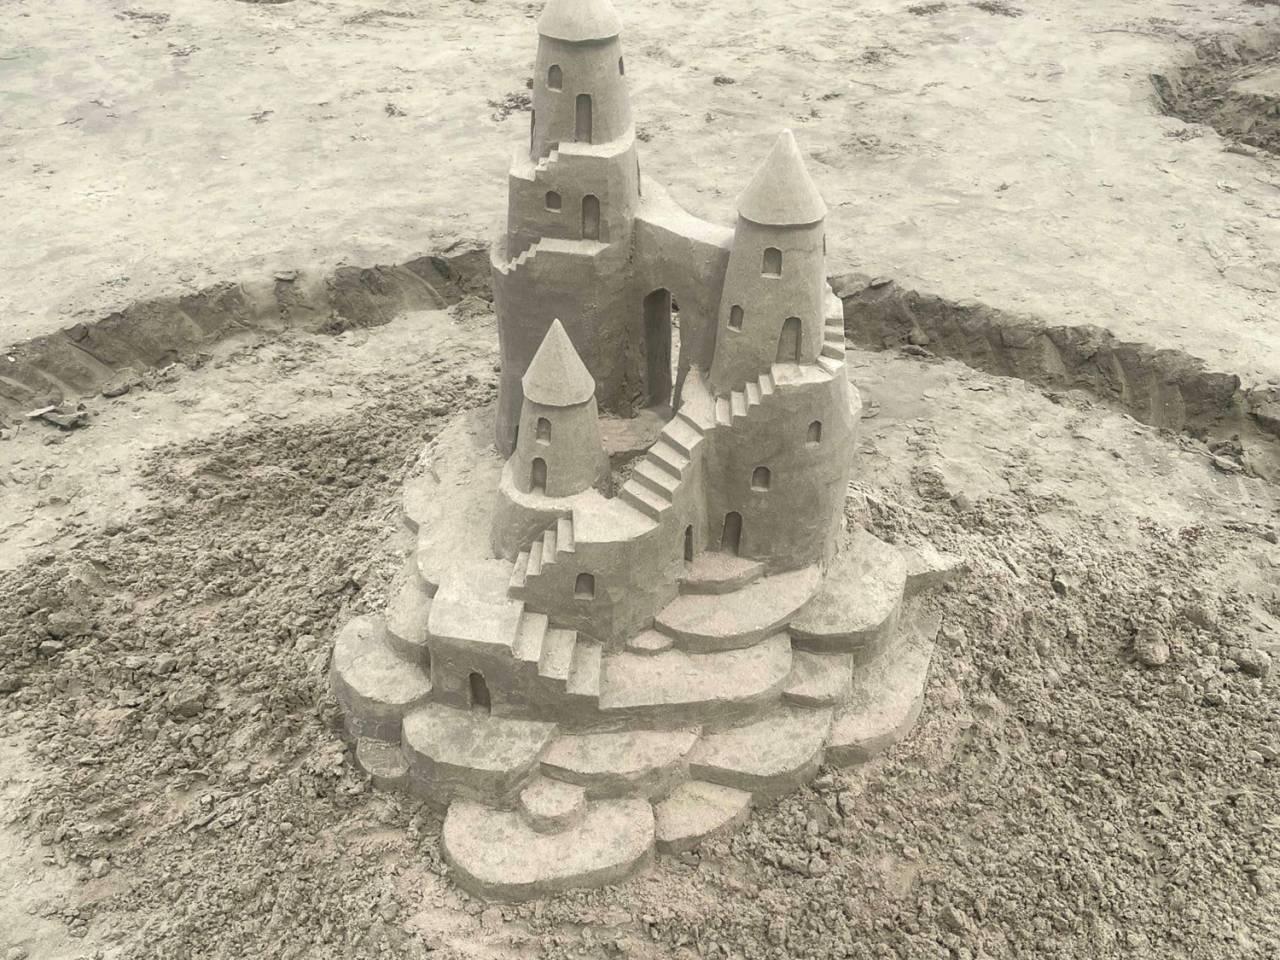 Sandy Feet Sand Castle Services